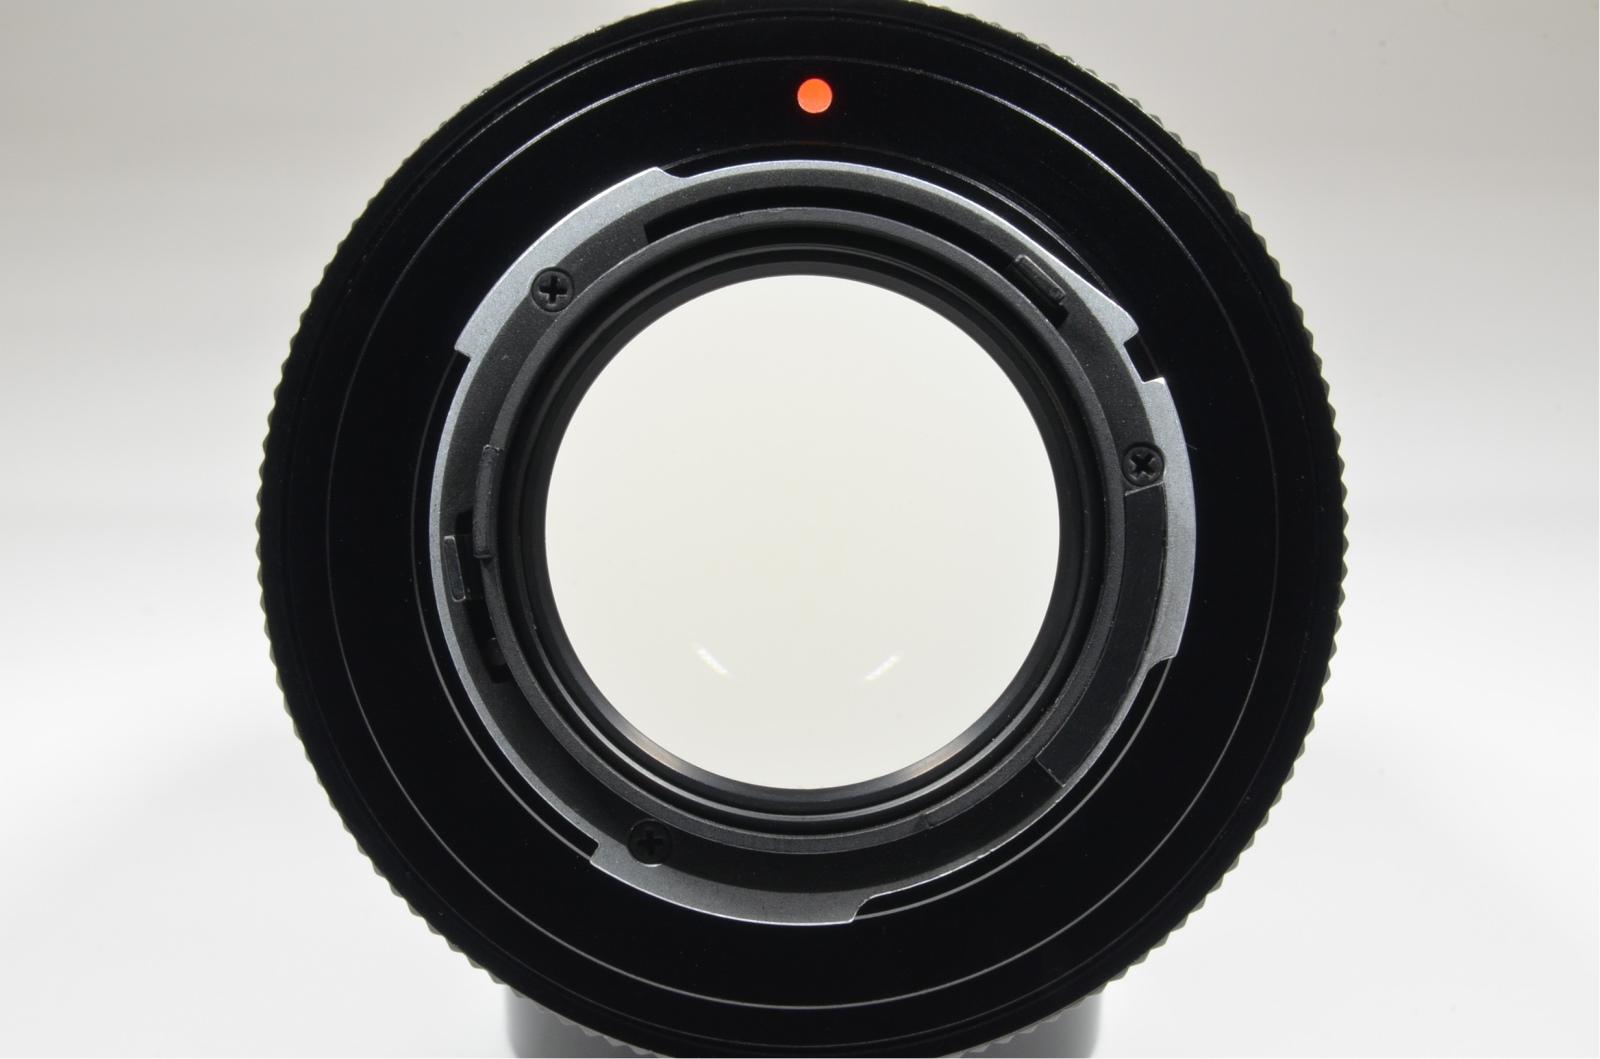 contax carl zeiss planar t* 85mm f1.4 aeg west germany